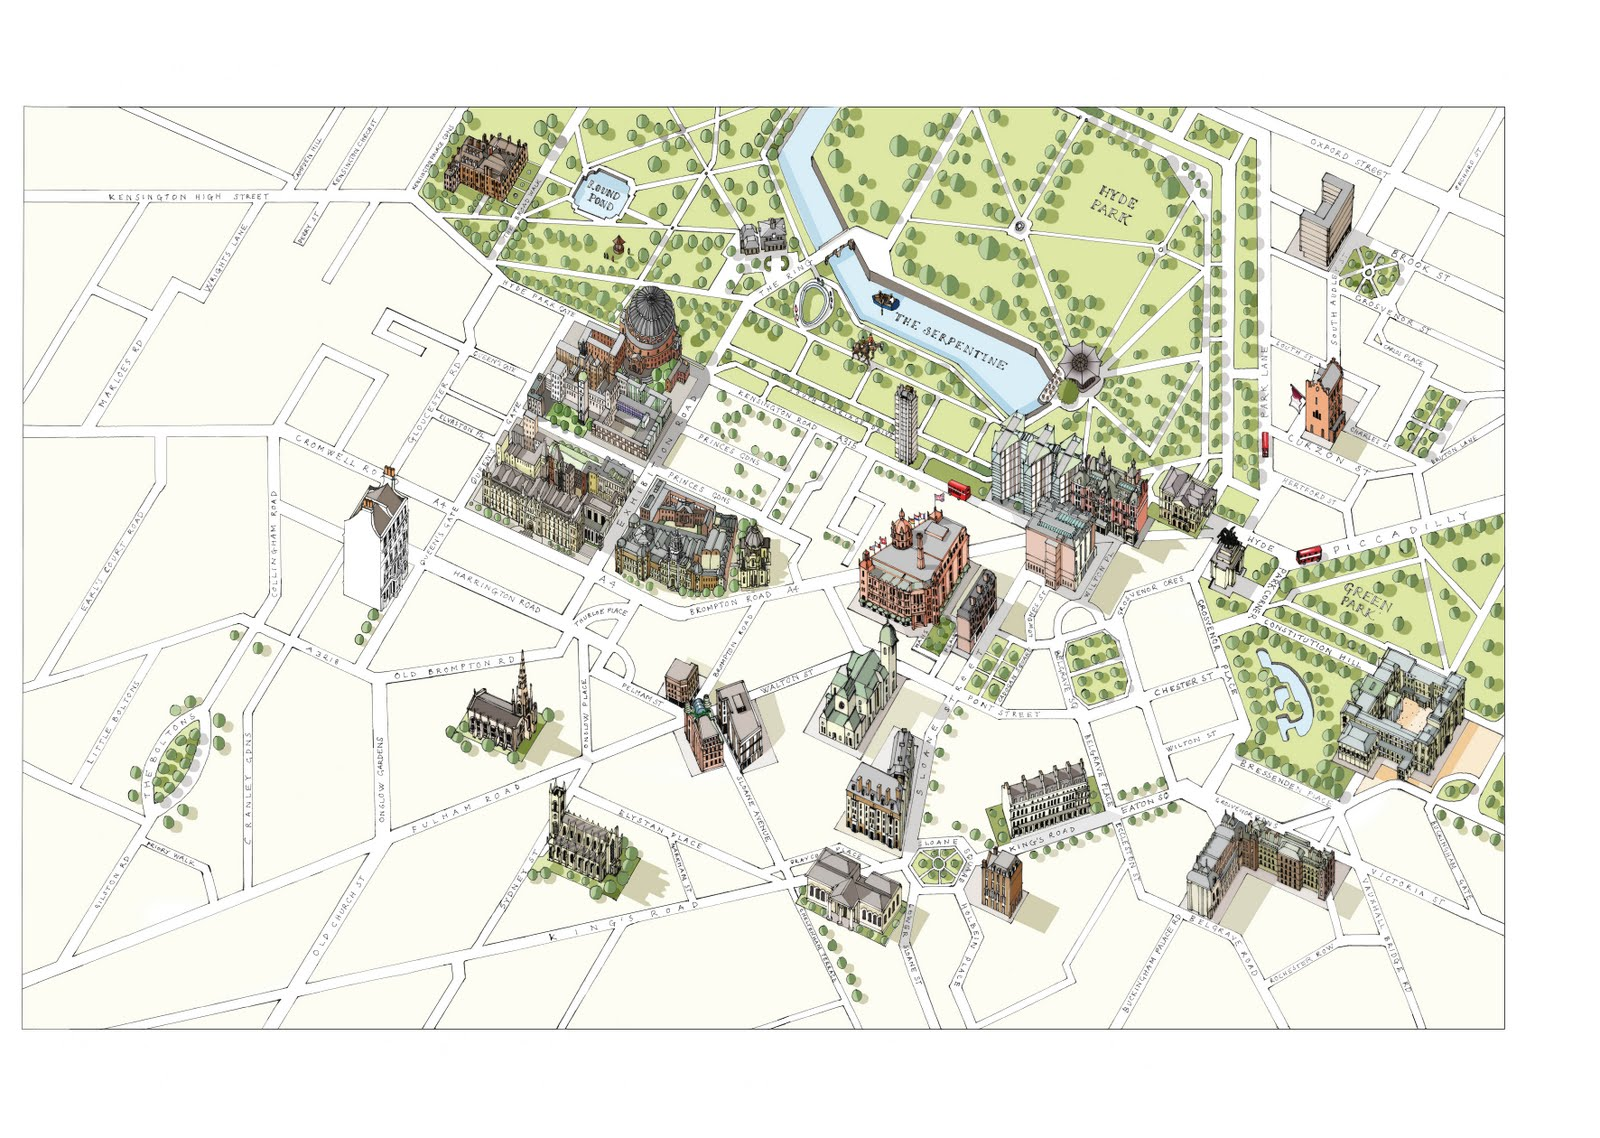 Katherine Baxter illustrator ILLUSTRATED MAP OF LONDON